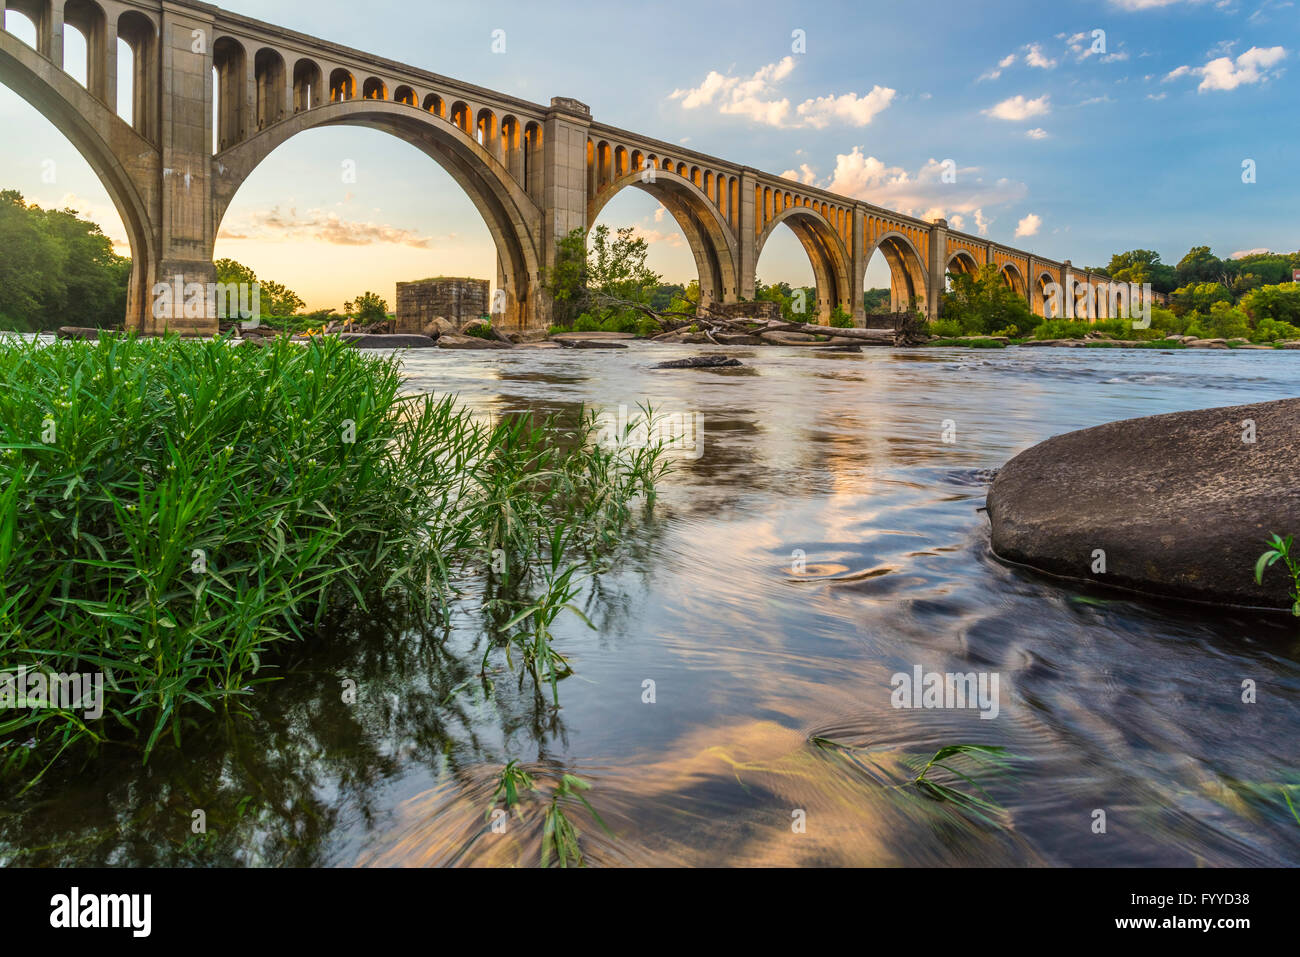 A graceful concrete arch bridge spans the James River near Richmond, Virginia, USA. Stock Photo